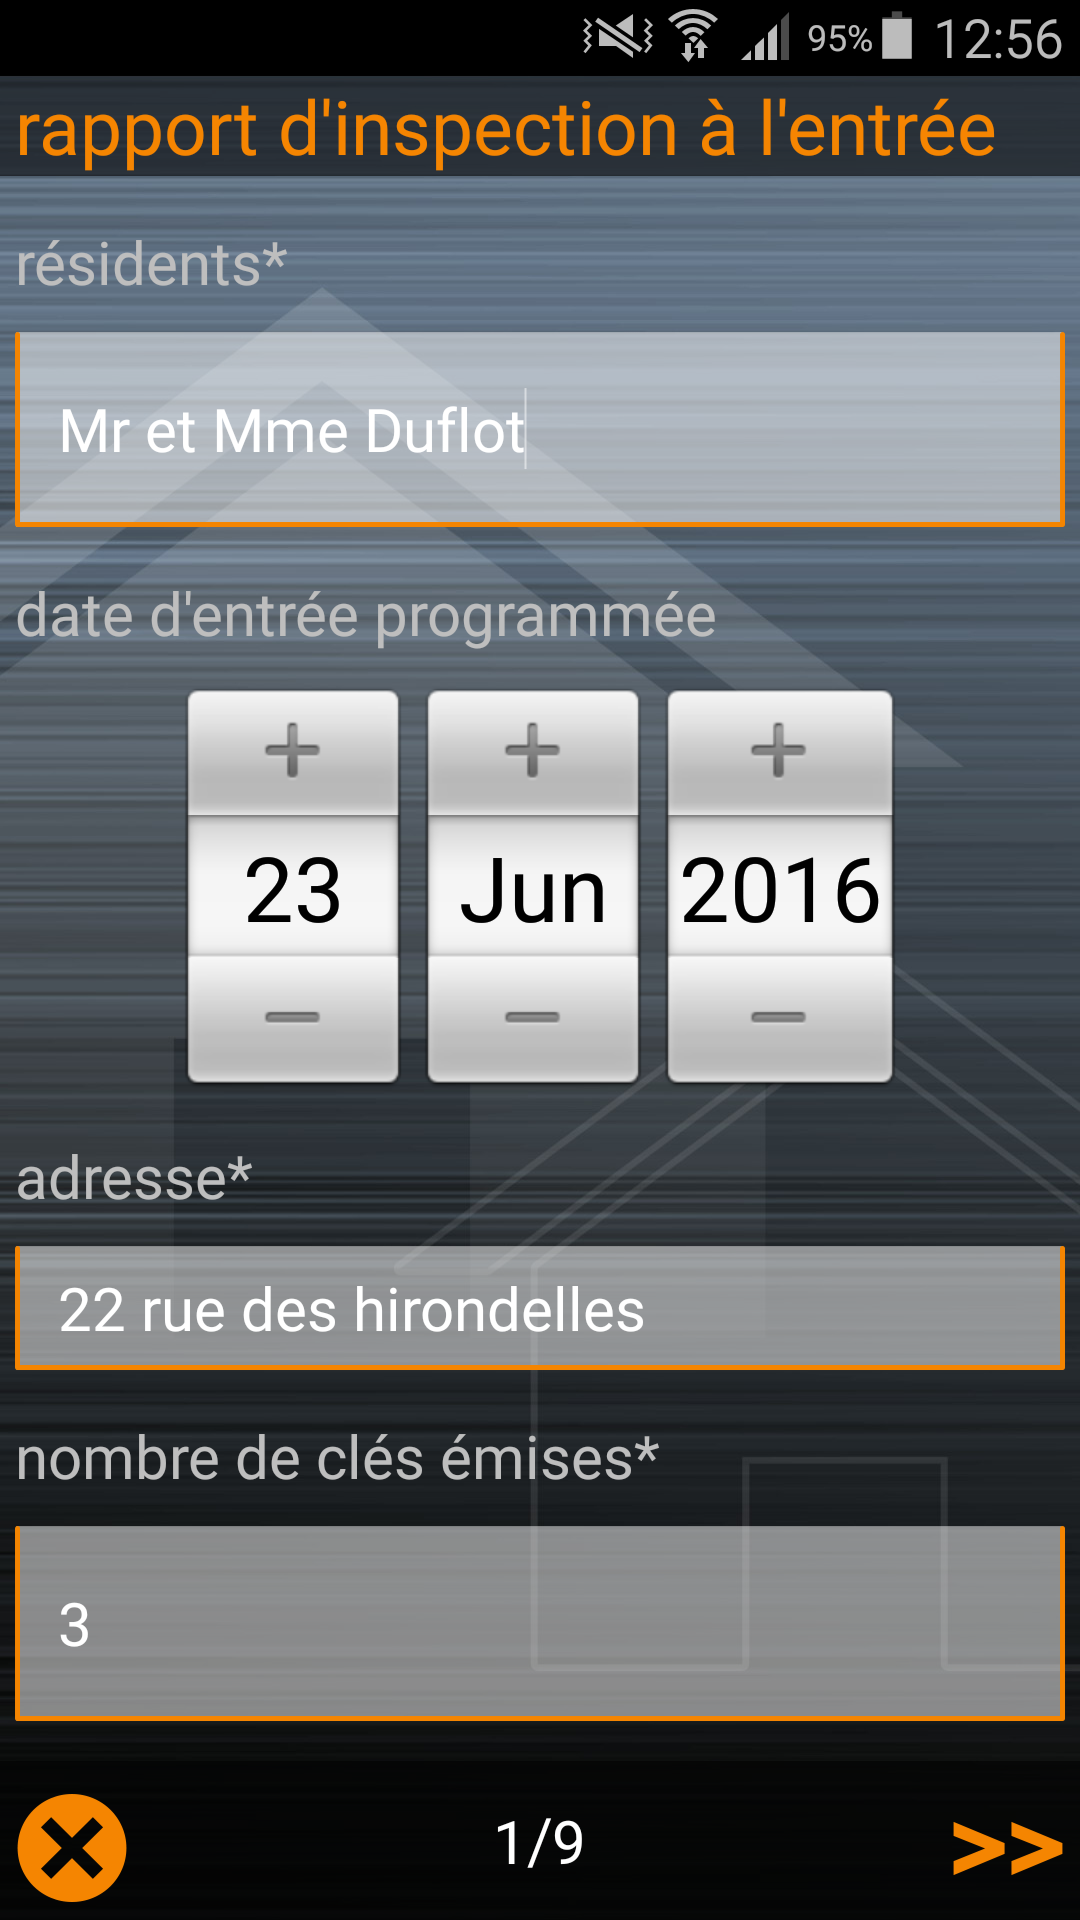 ginstr_app_flatHandoverChecklist_FR_2